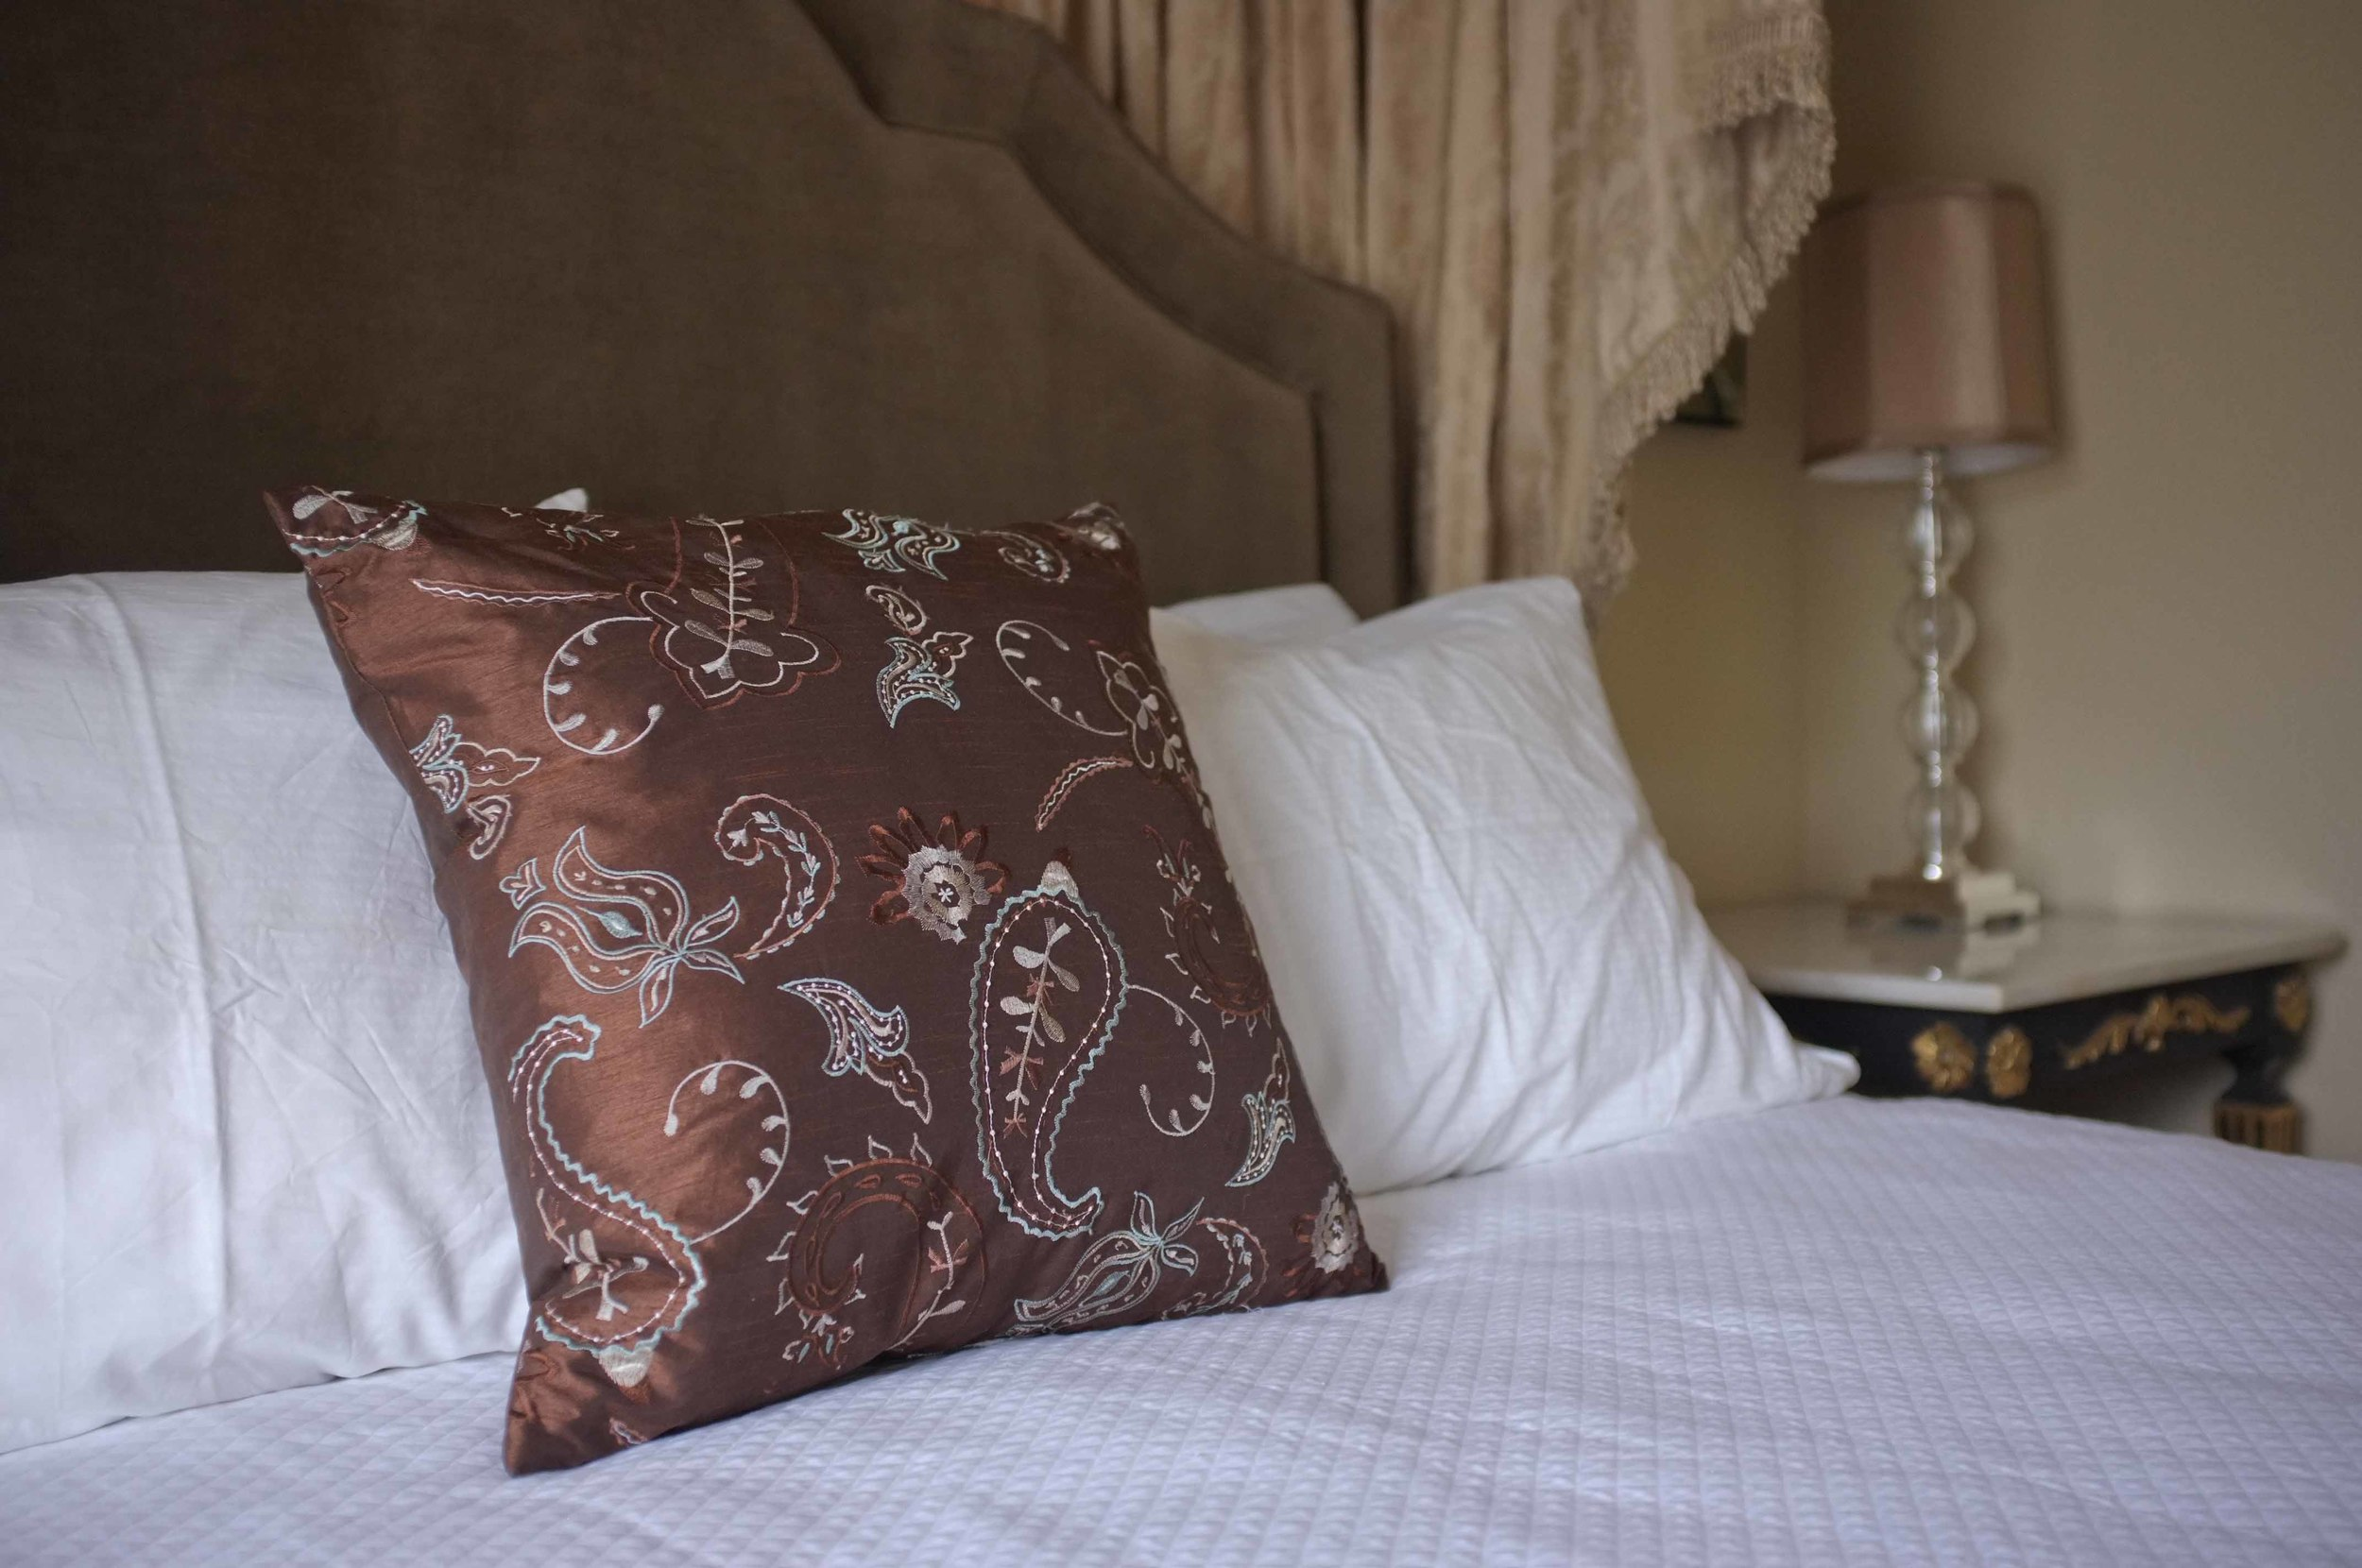 Queen Upstairs bed linens